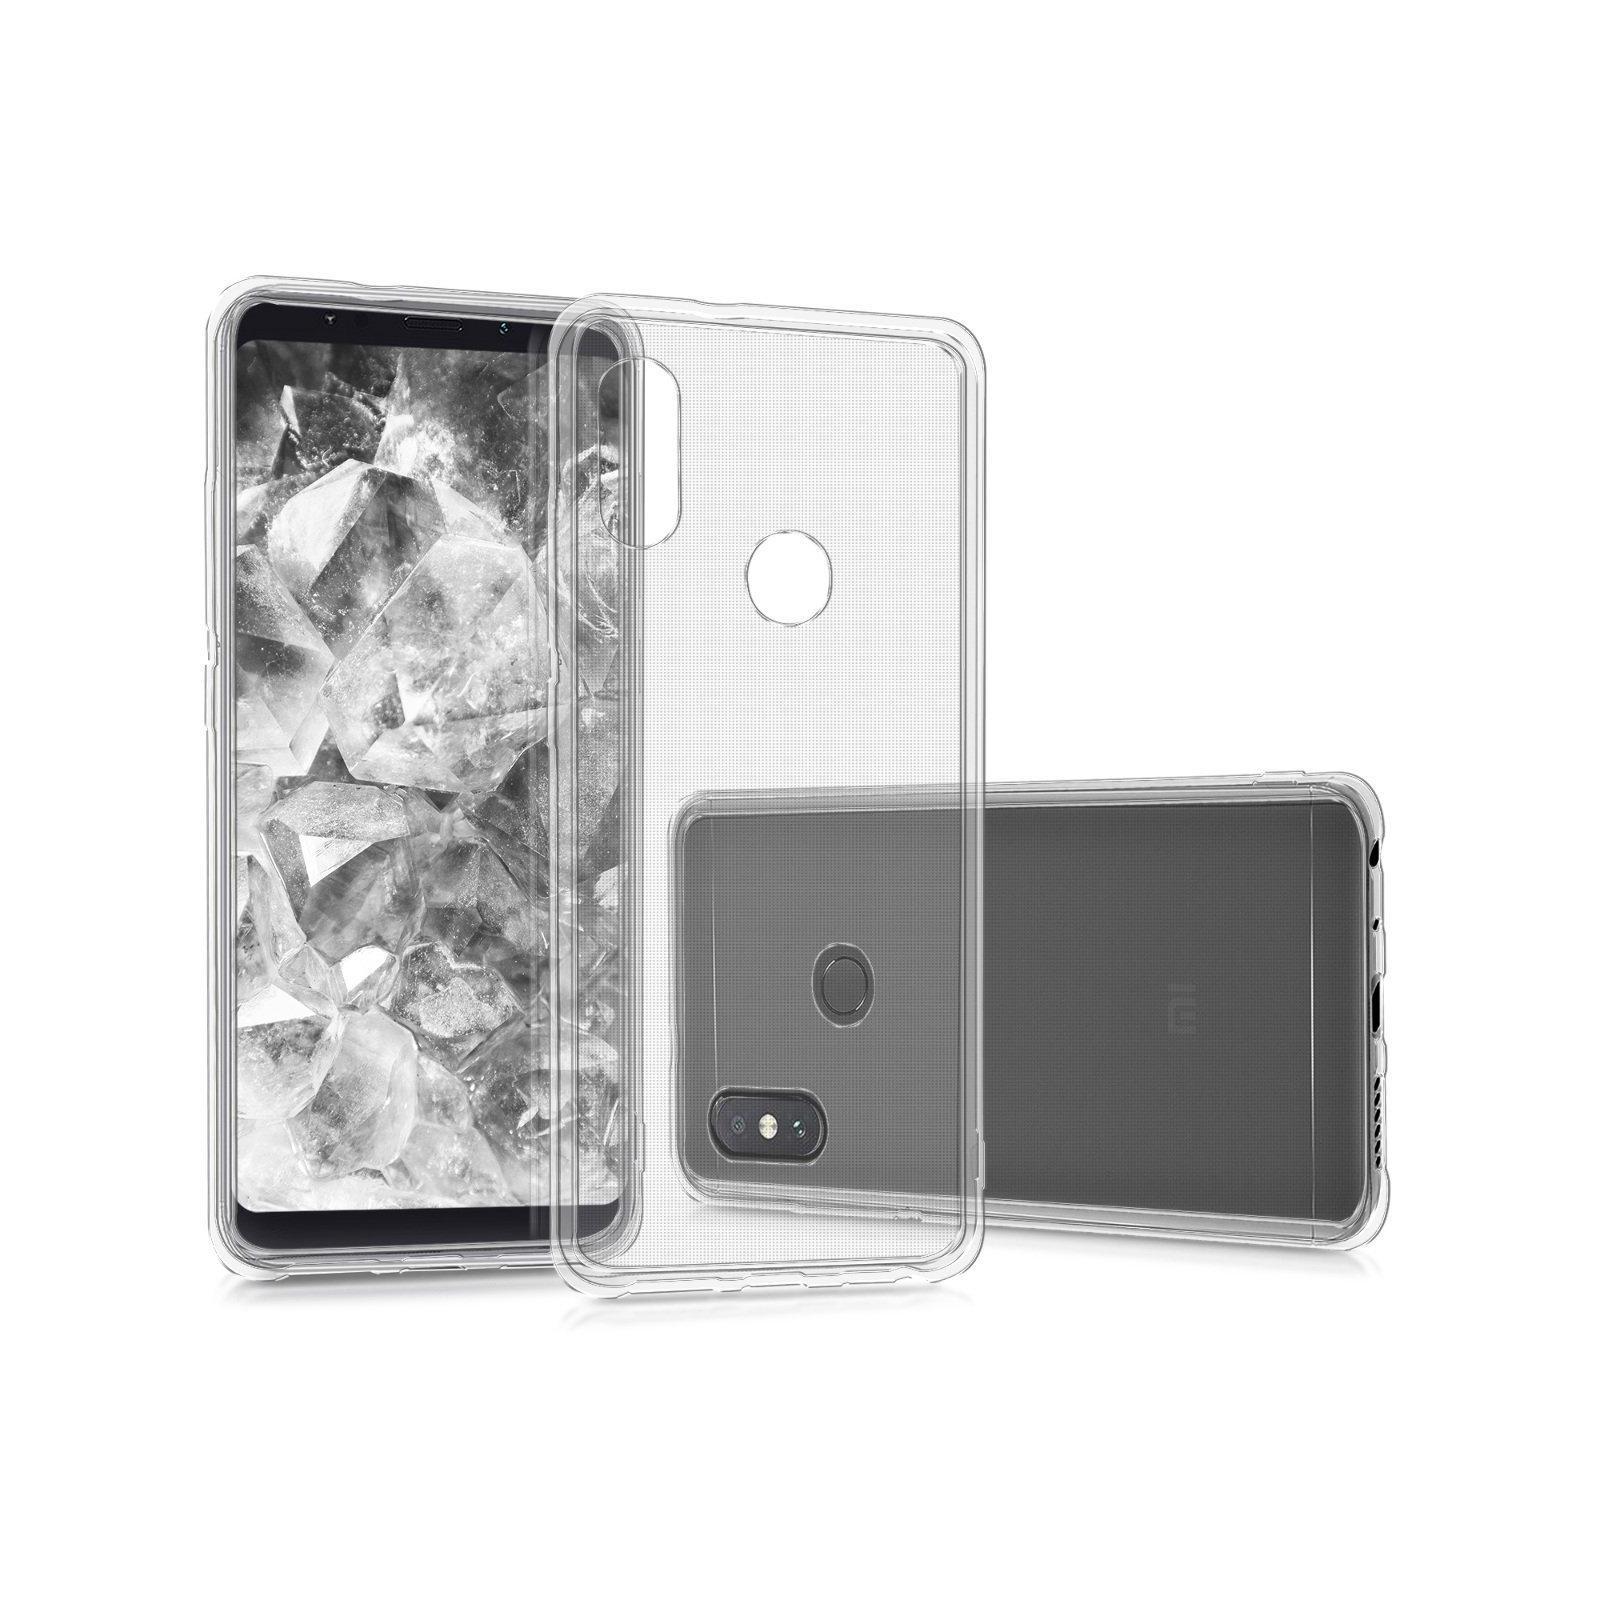 Чехол для моб. телефона Laudtec для Xiaomi Redmi Note 5 Pro Clear tpu (Transperent) (LC-XRN5P) изображение 11